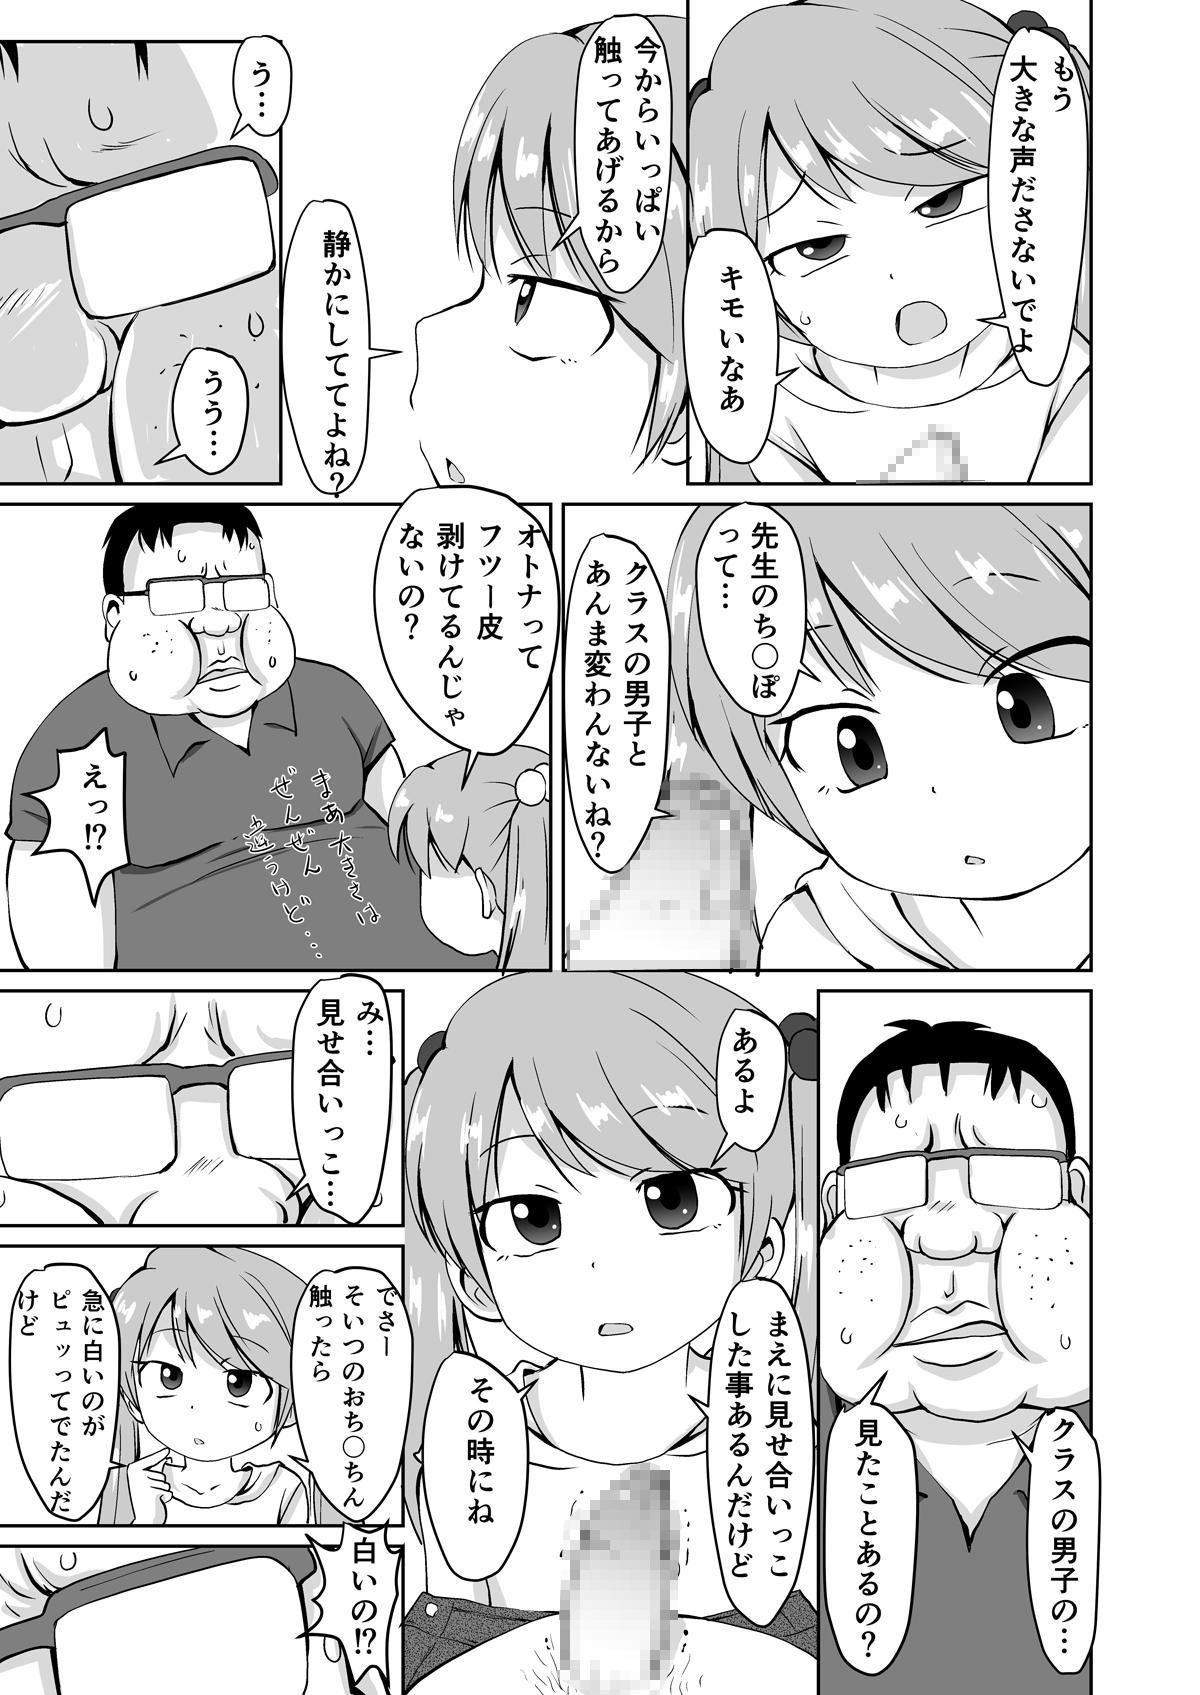 Houkago Buotoko Sensei 12